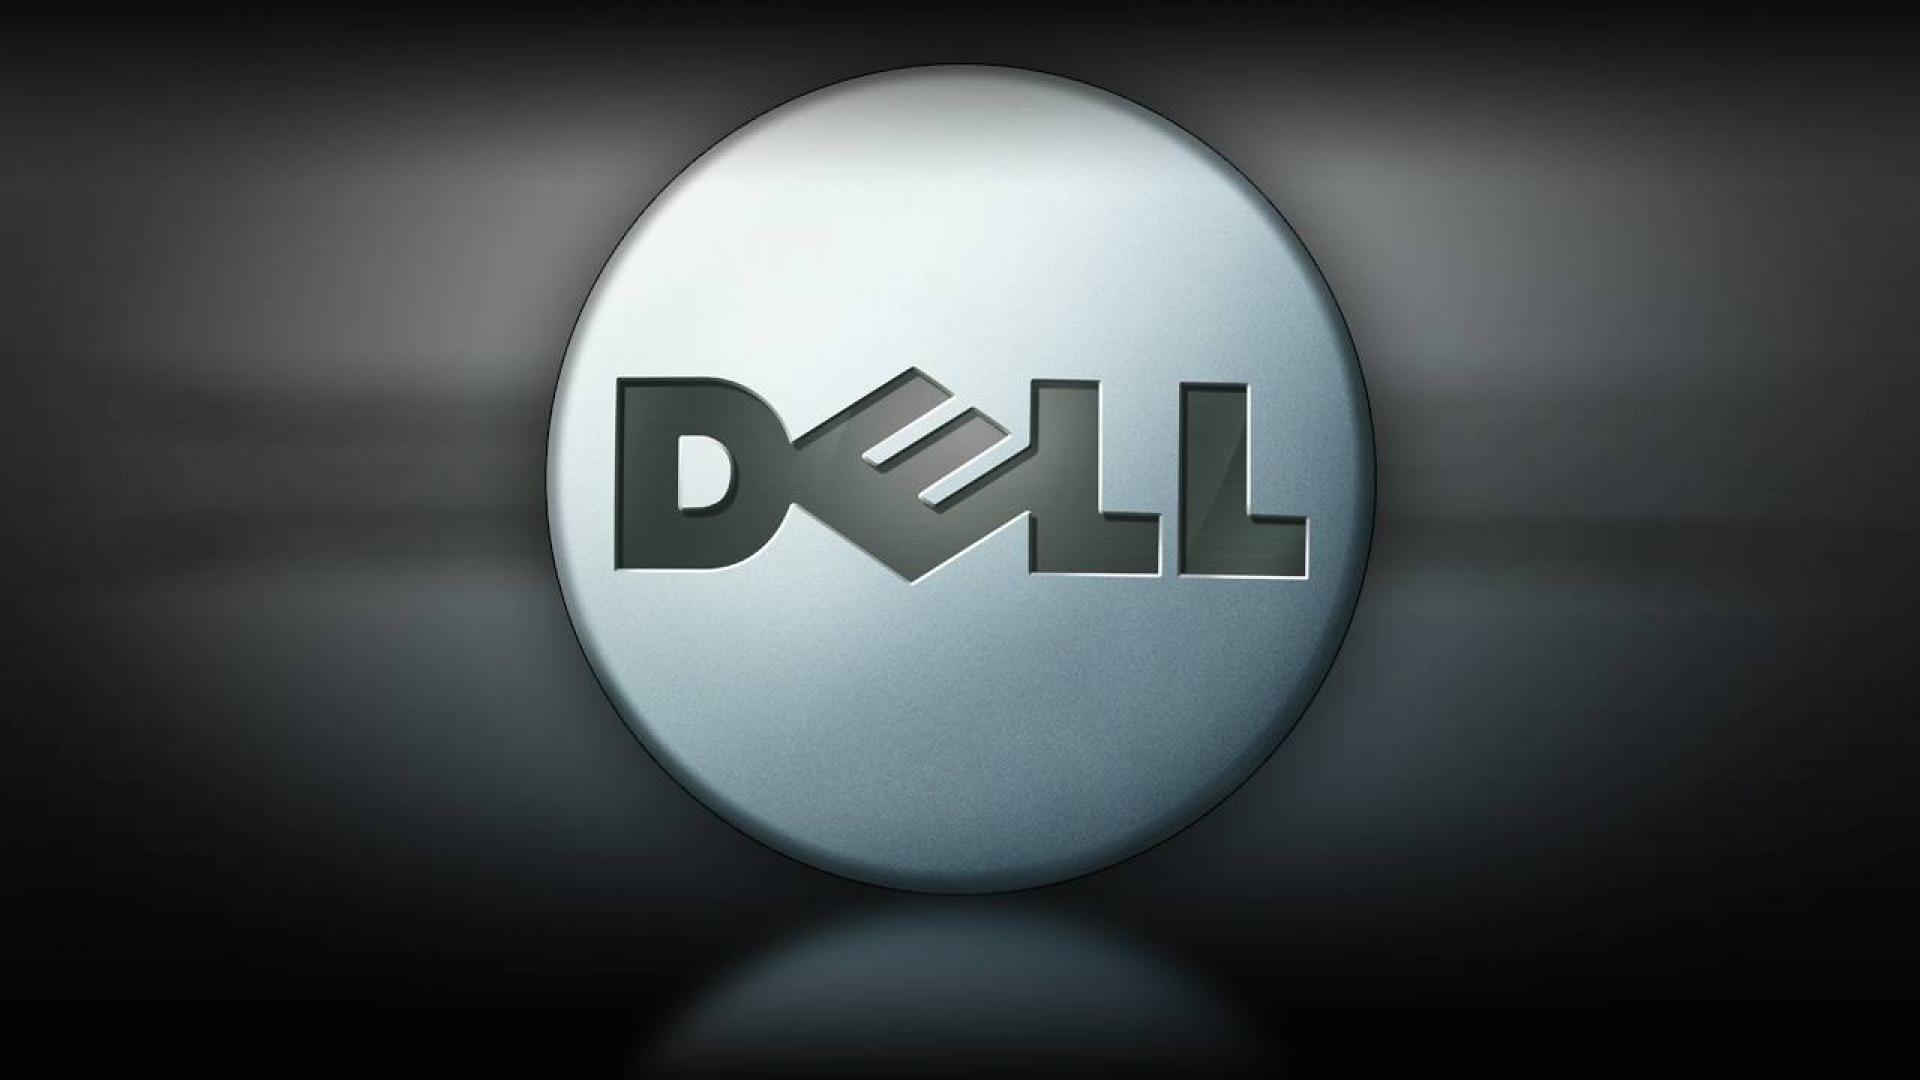 dell logo hd